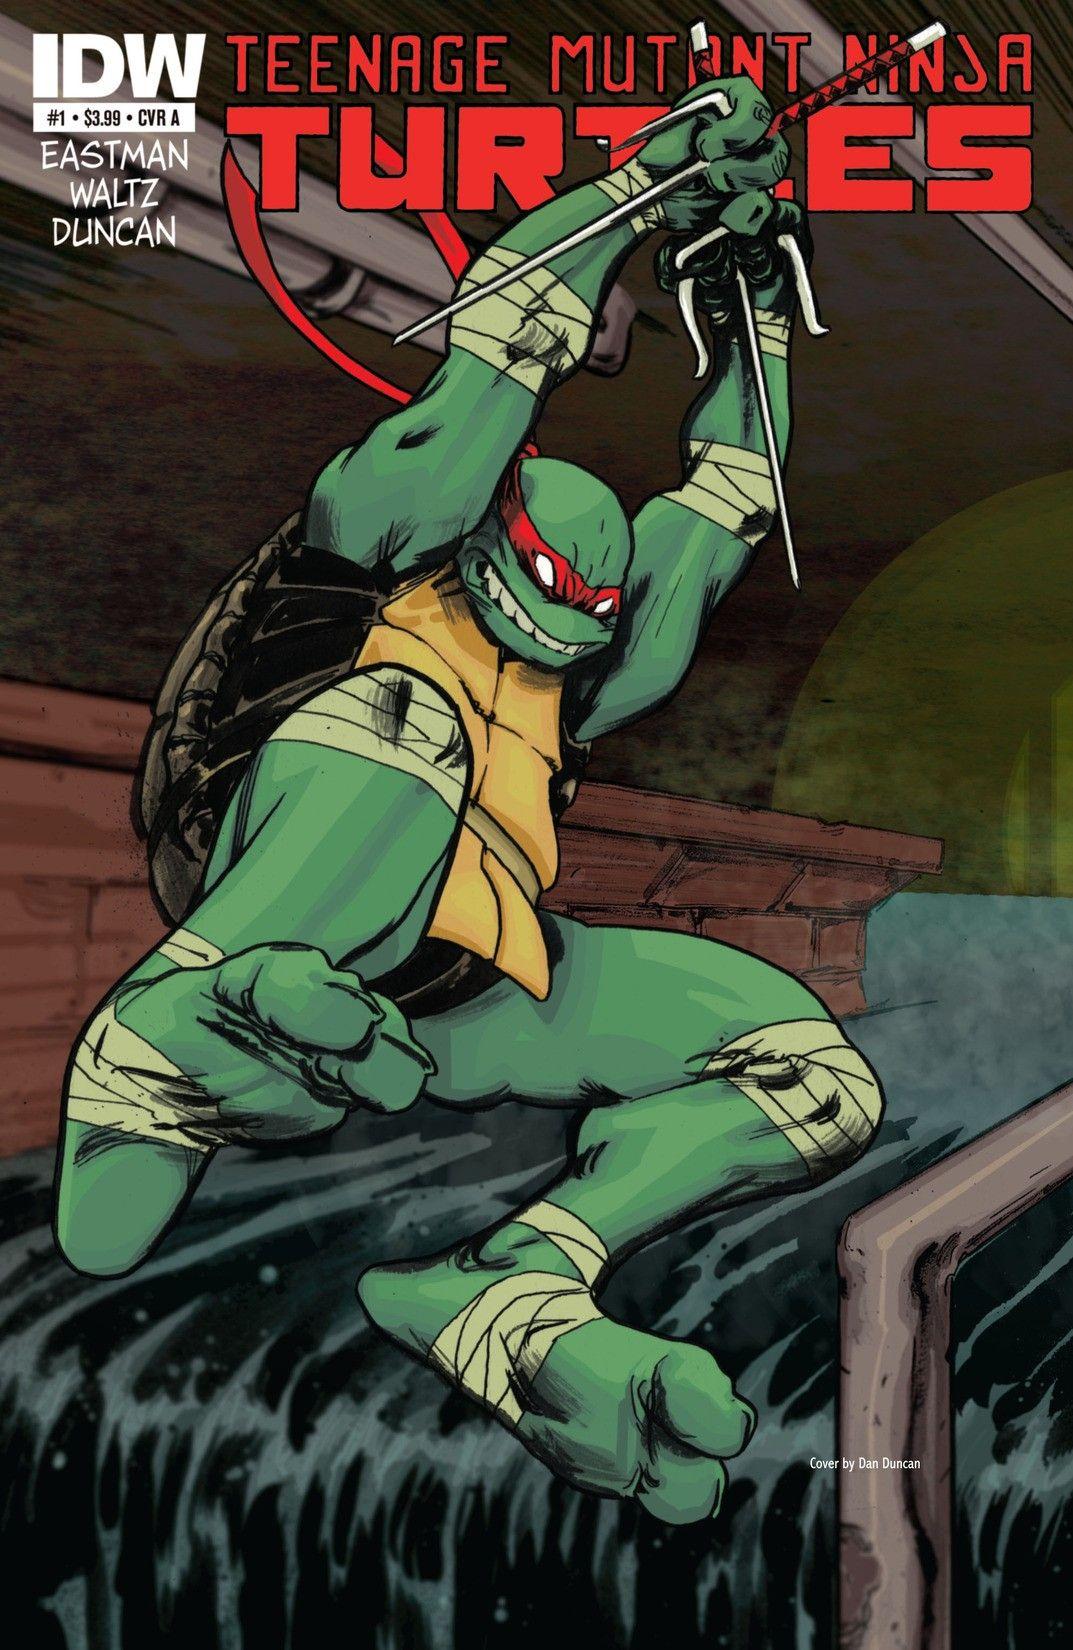 Teenage Mutant Ninja Turtles #1 Free Digital Comic by IDW Publishing @ Comixology (Free Download)